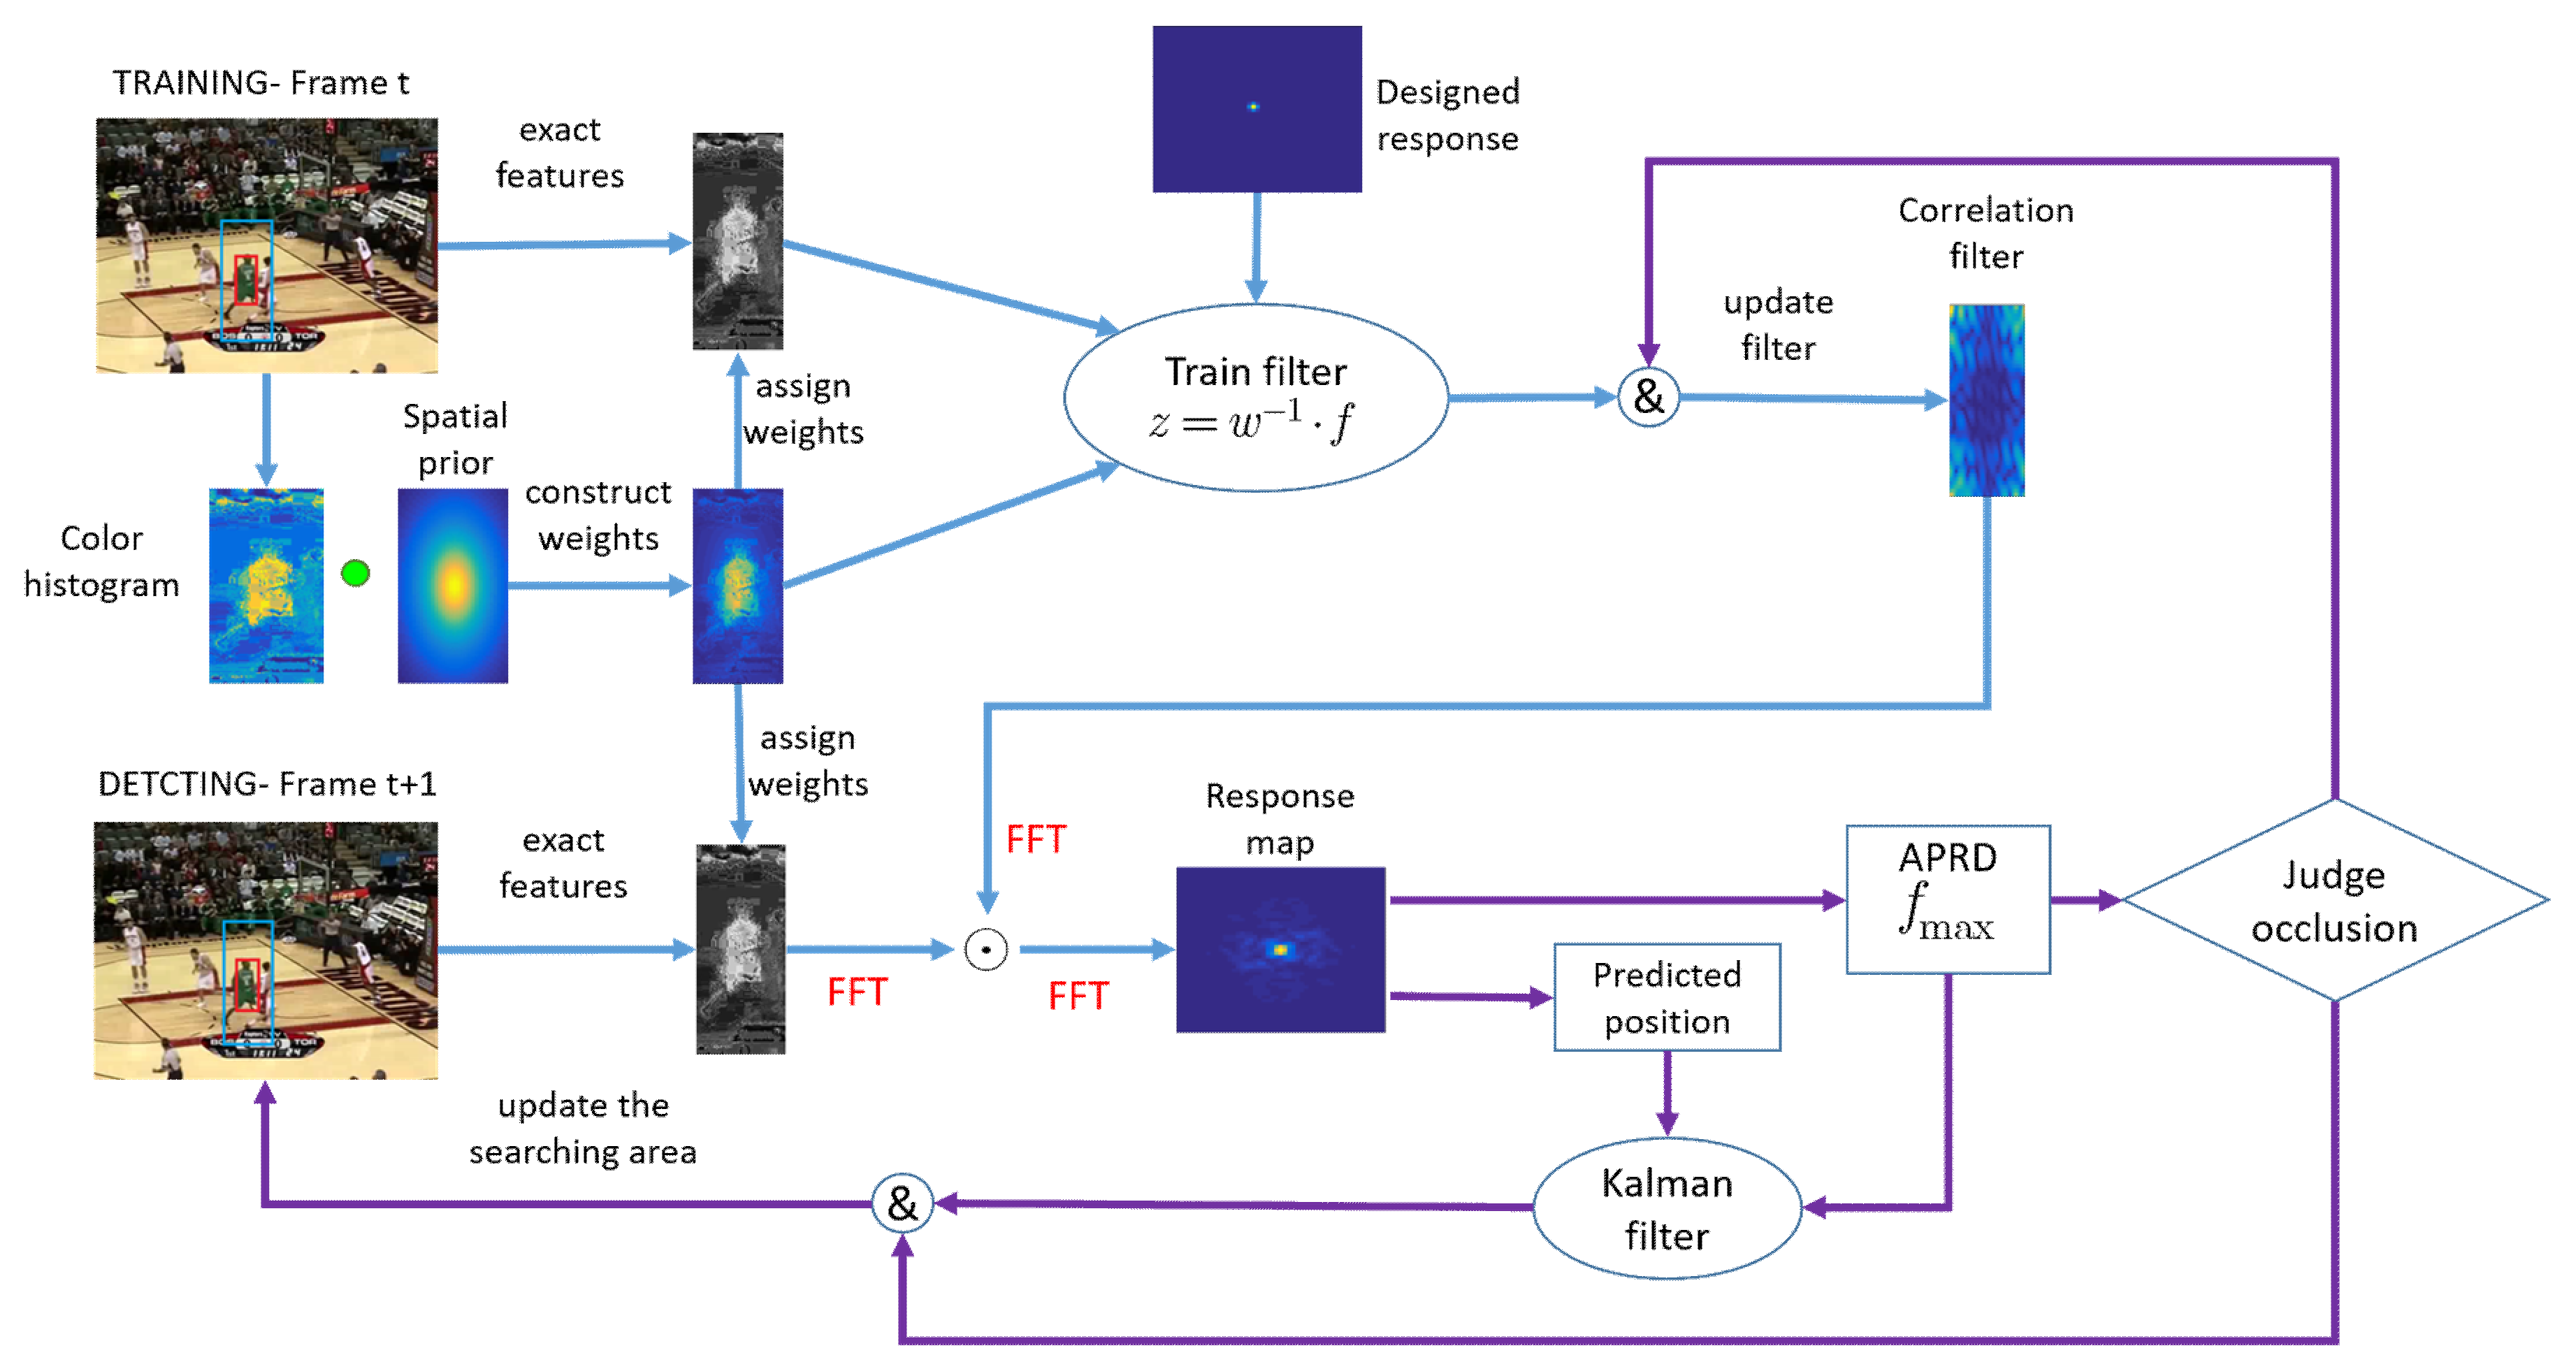 Sensors | Free Full-Text | Improved Correlation Filter